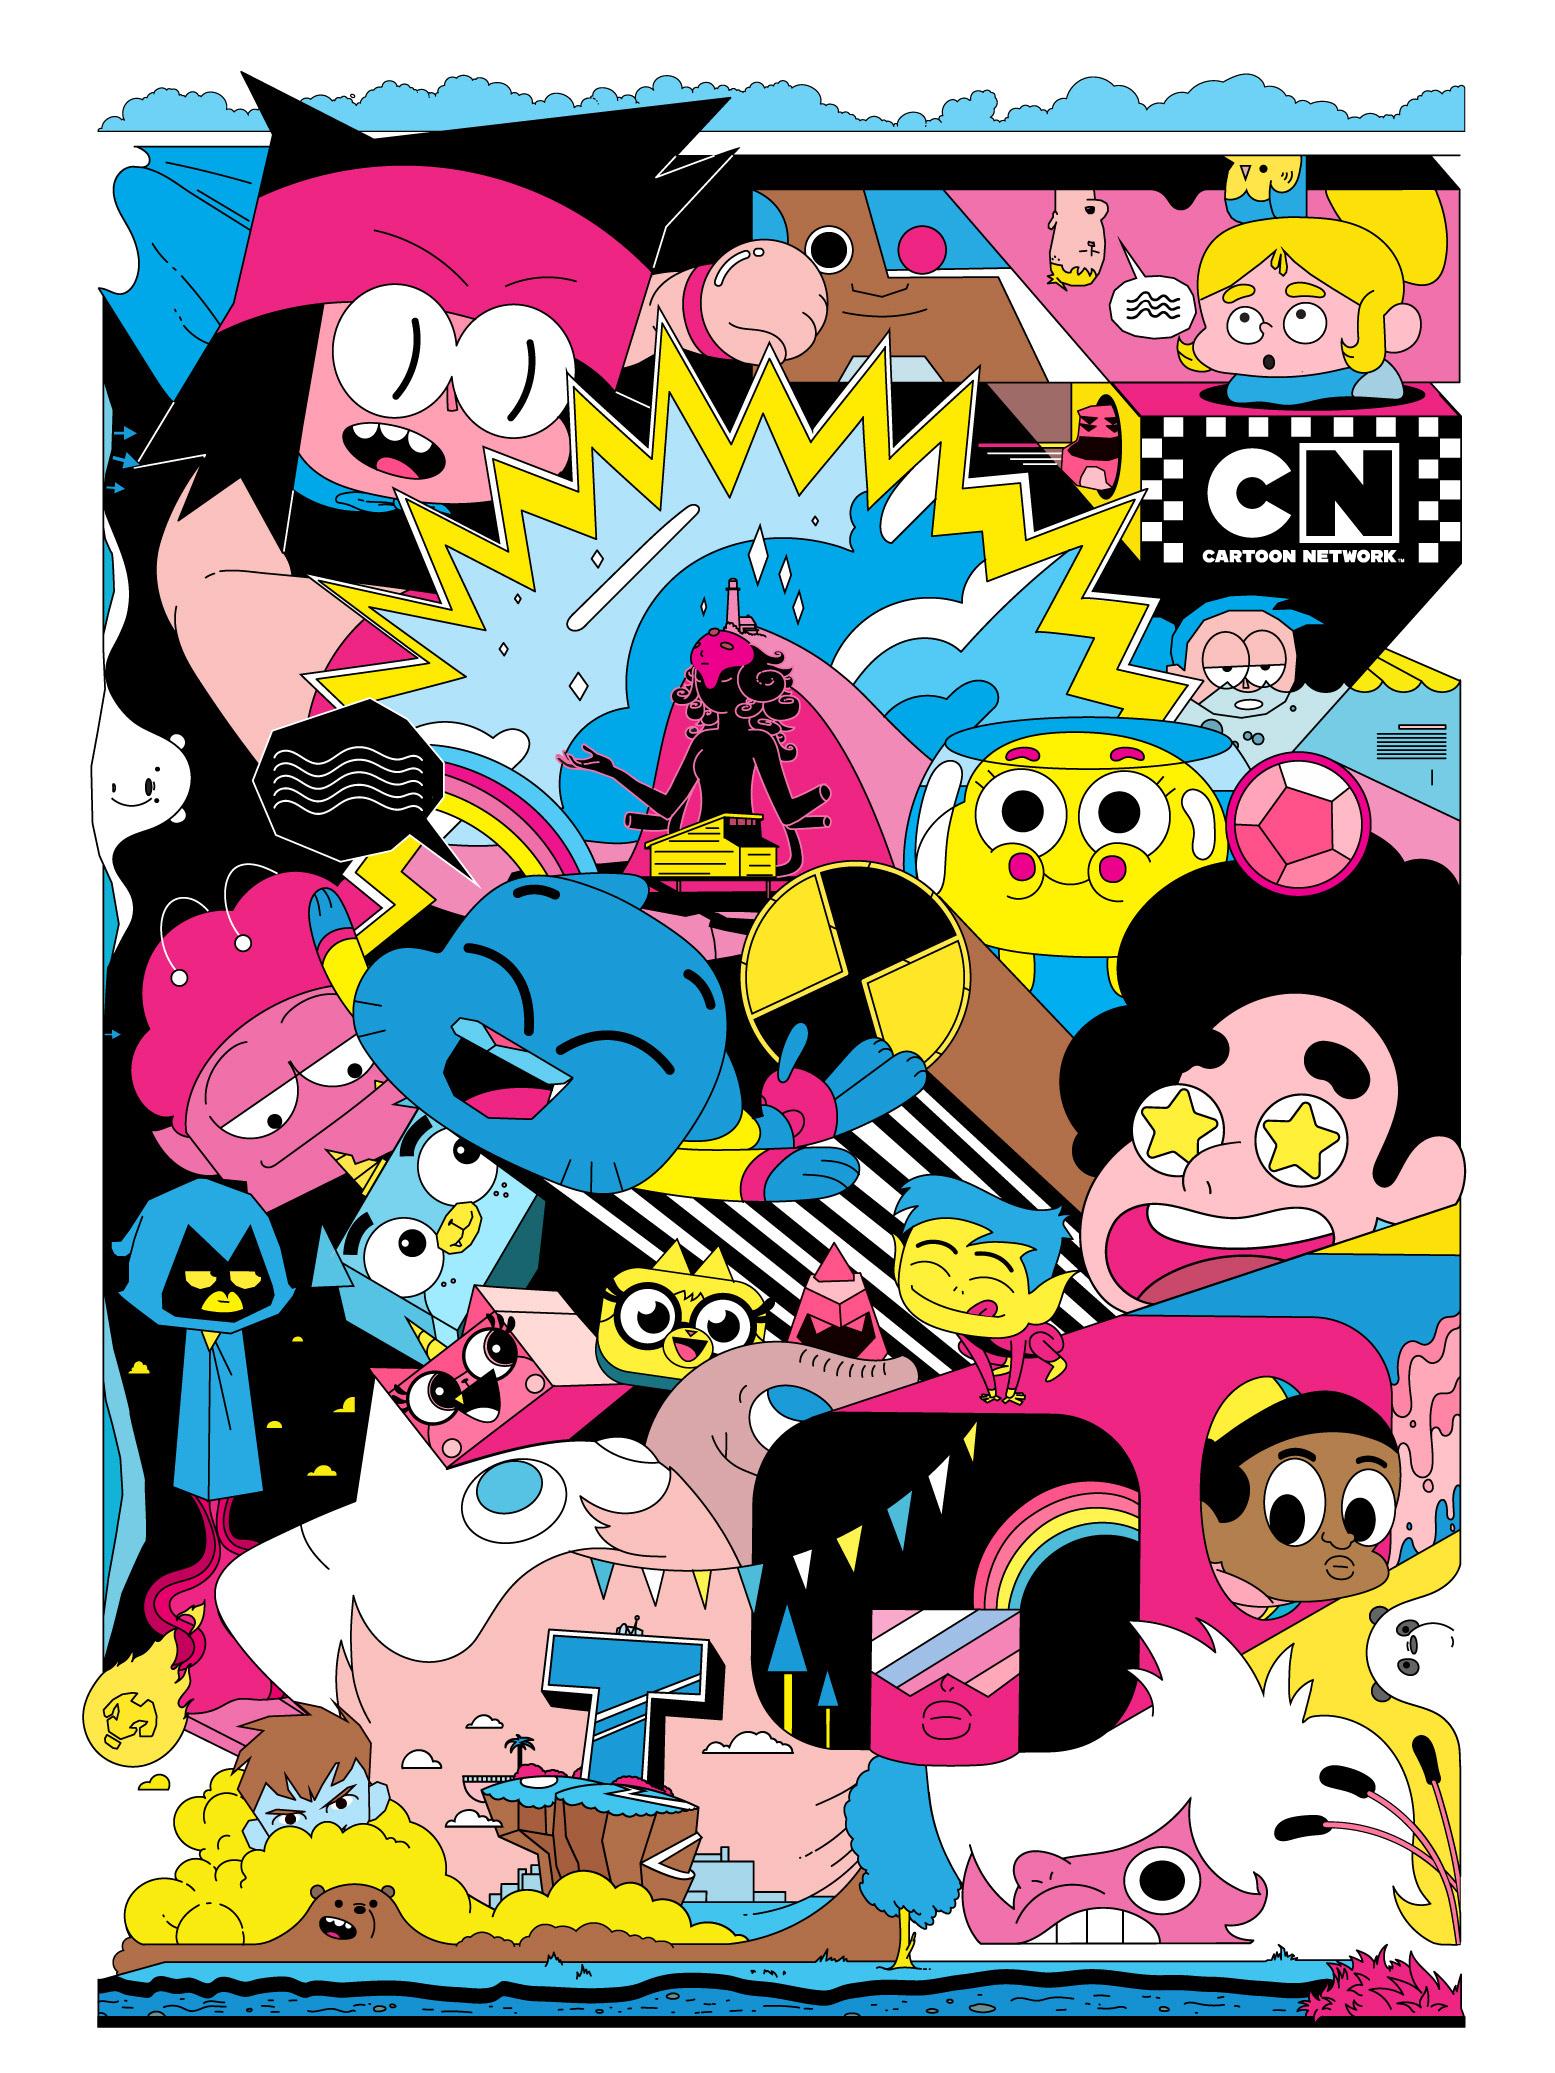 ori toor - Cartoon Network - Official 2018 key art